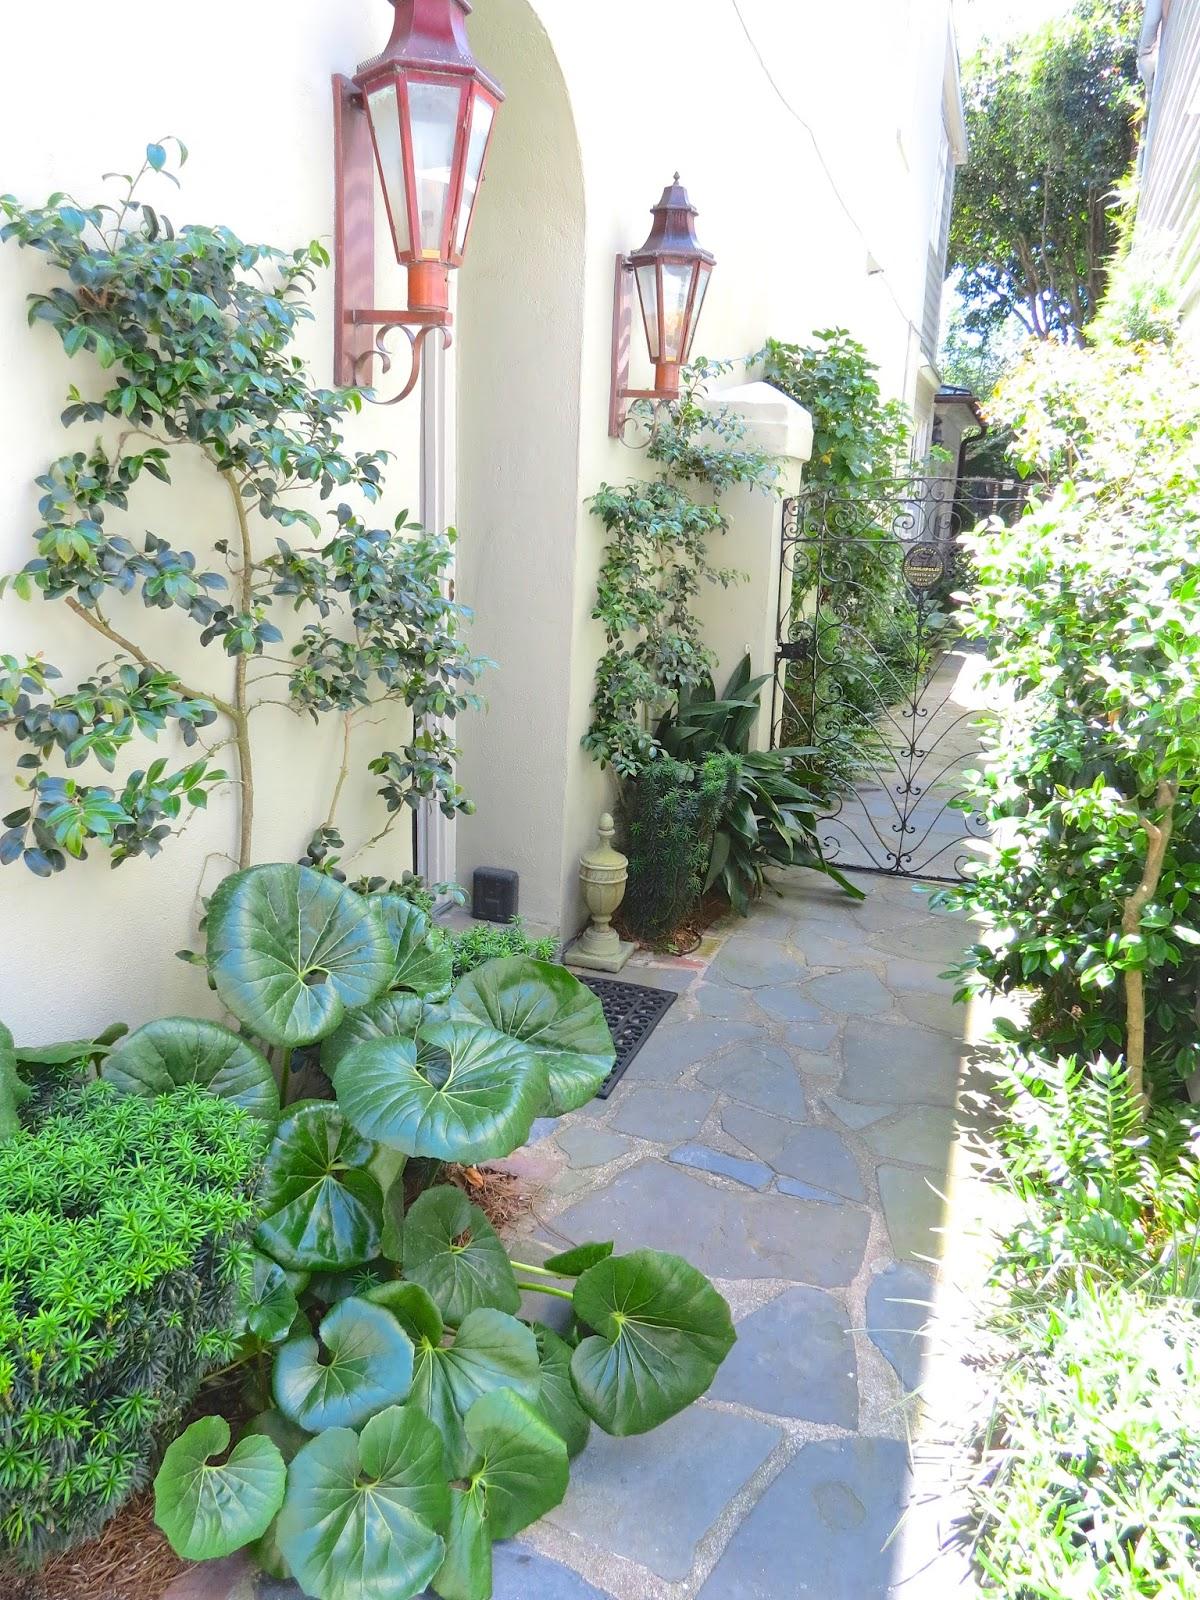 JLL DESIGN Window Box Ideas Amp More Garden Inspirations - Landscape Design Charleston Sc - Landscape Ideas